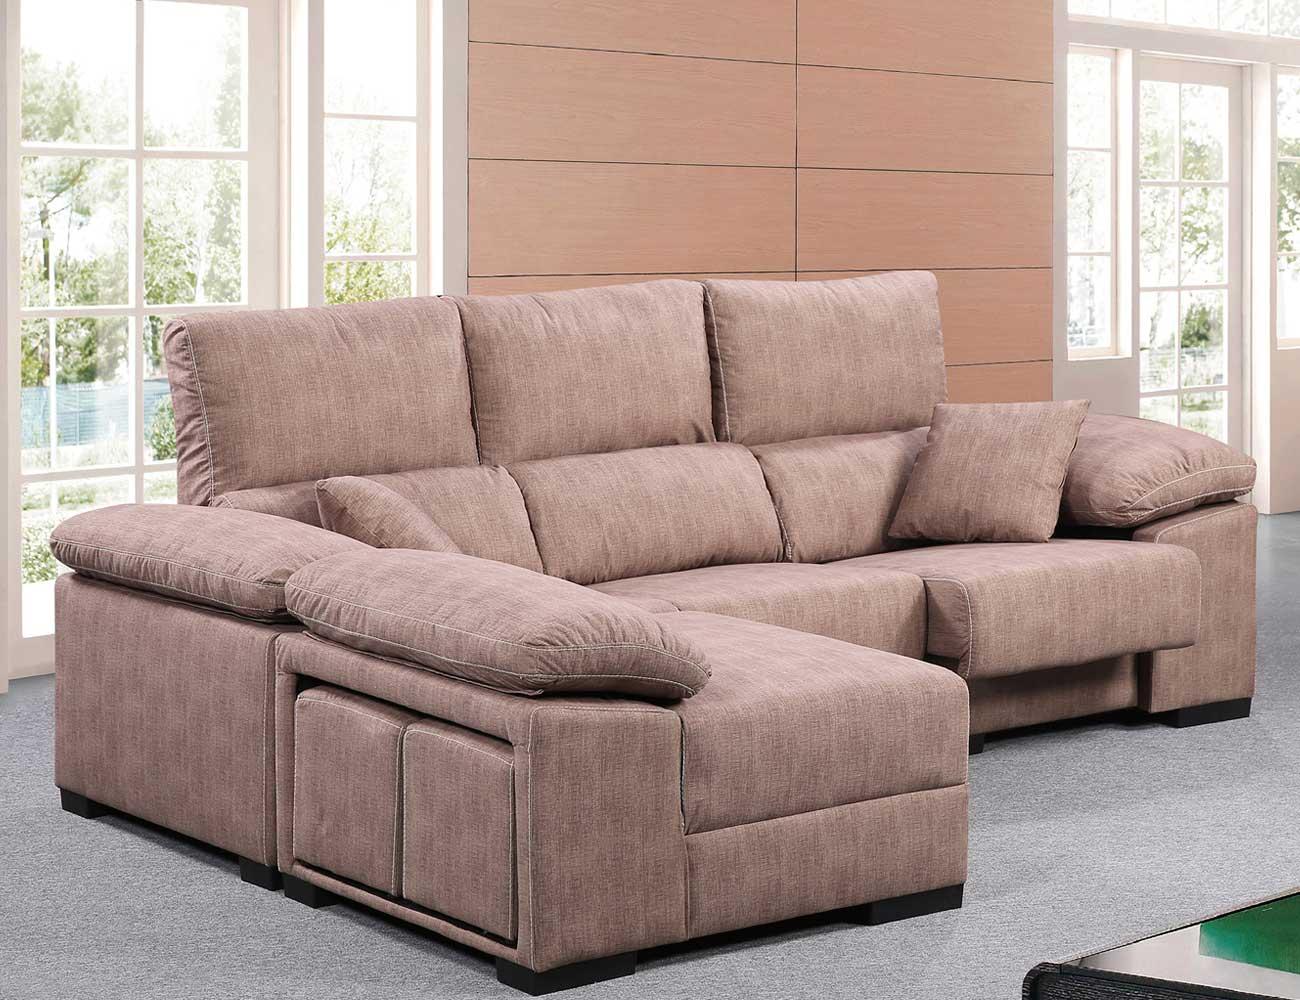 Sofa chaiselongue reversible 4 taburetes asientos extraible chocolate1